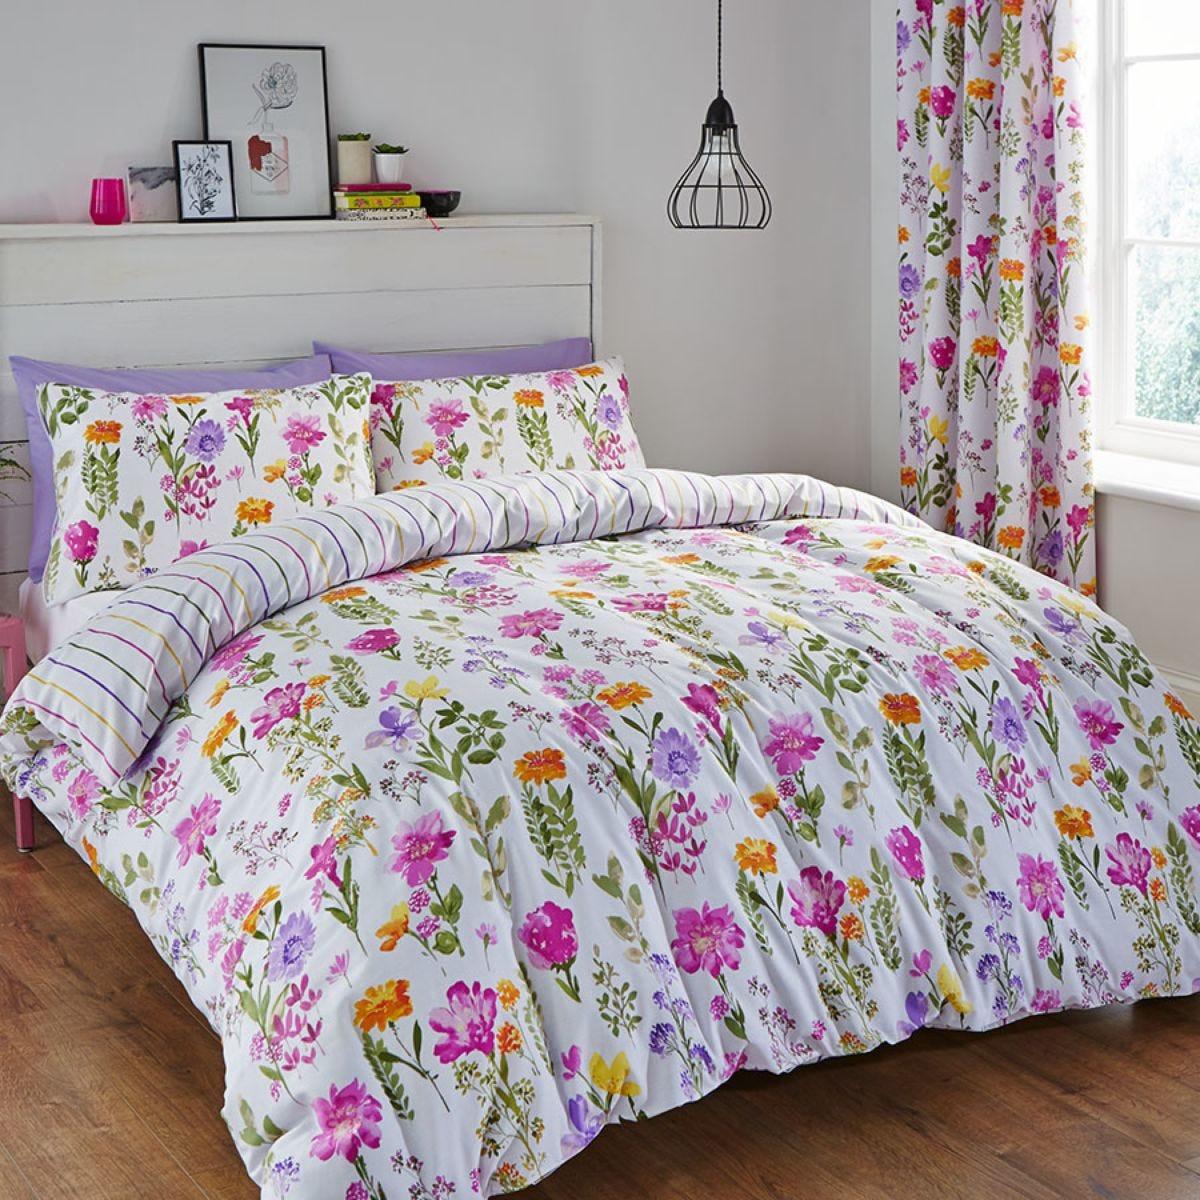 Catherine Lansfield Floral Meadow Duvet Set - Multi